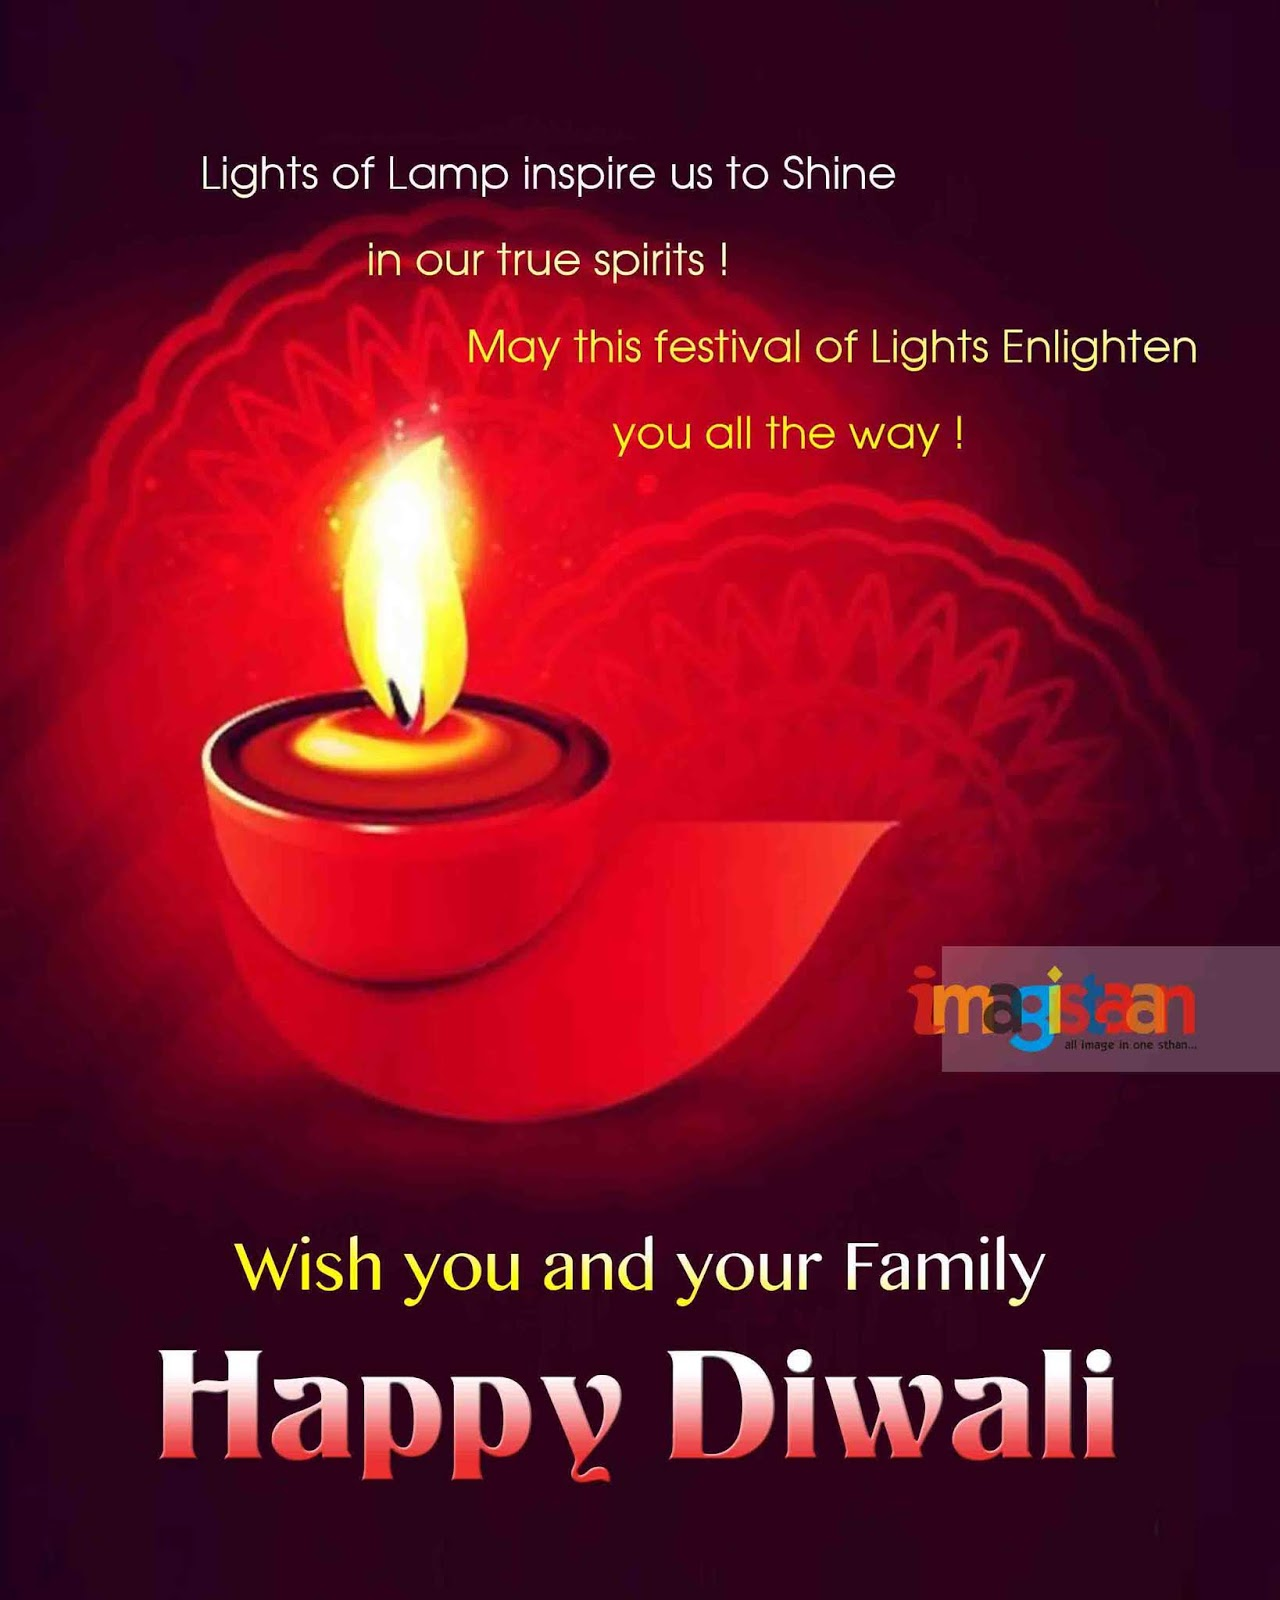 Free Deepawali Images 2018 / Deepawali Wishing Templates Image 2018 ...